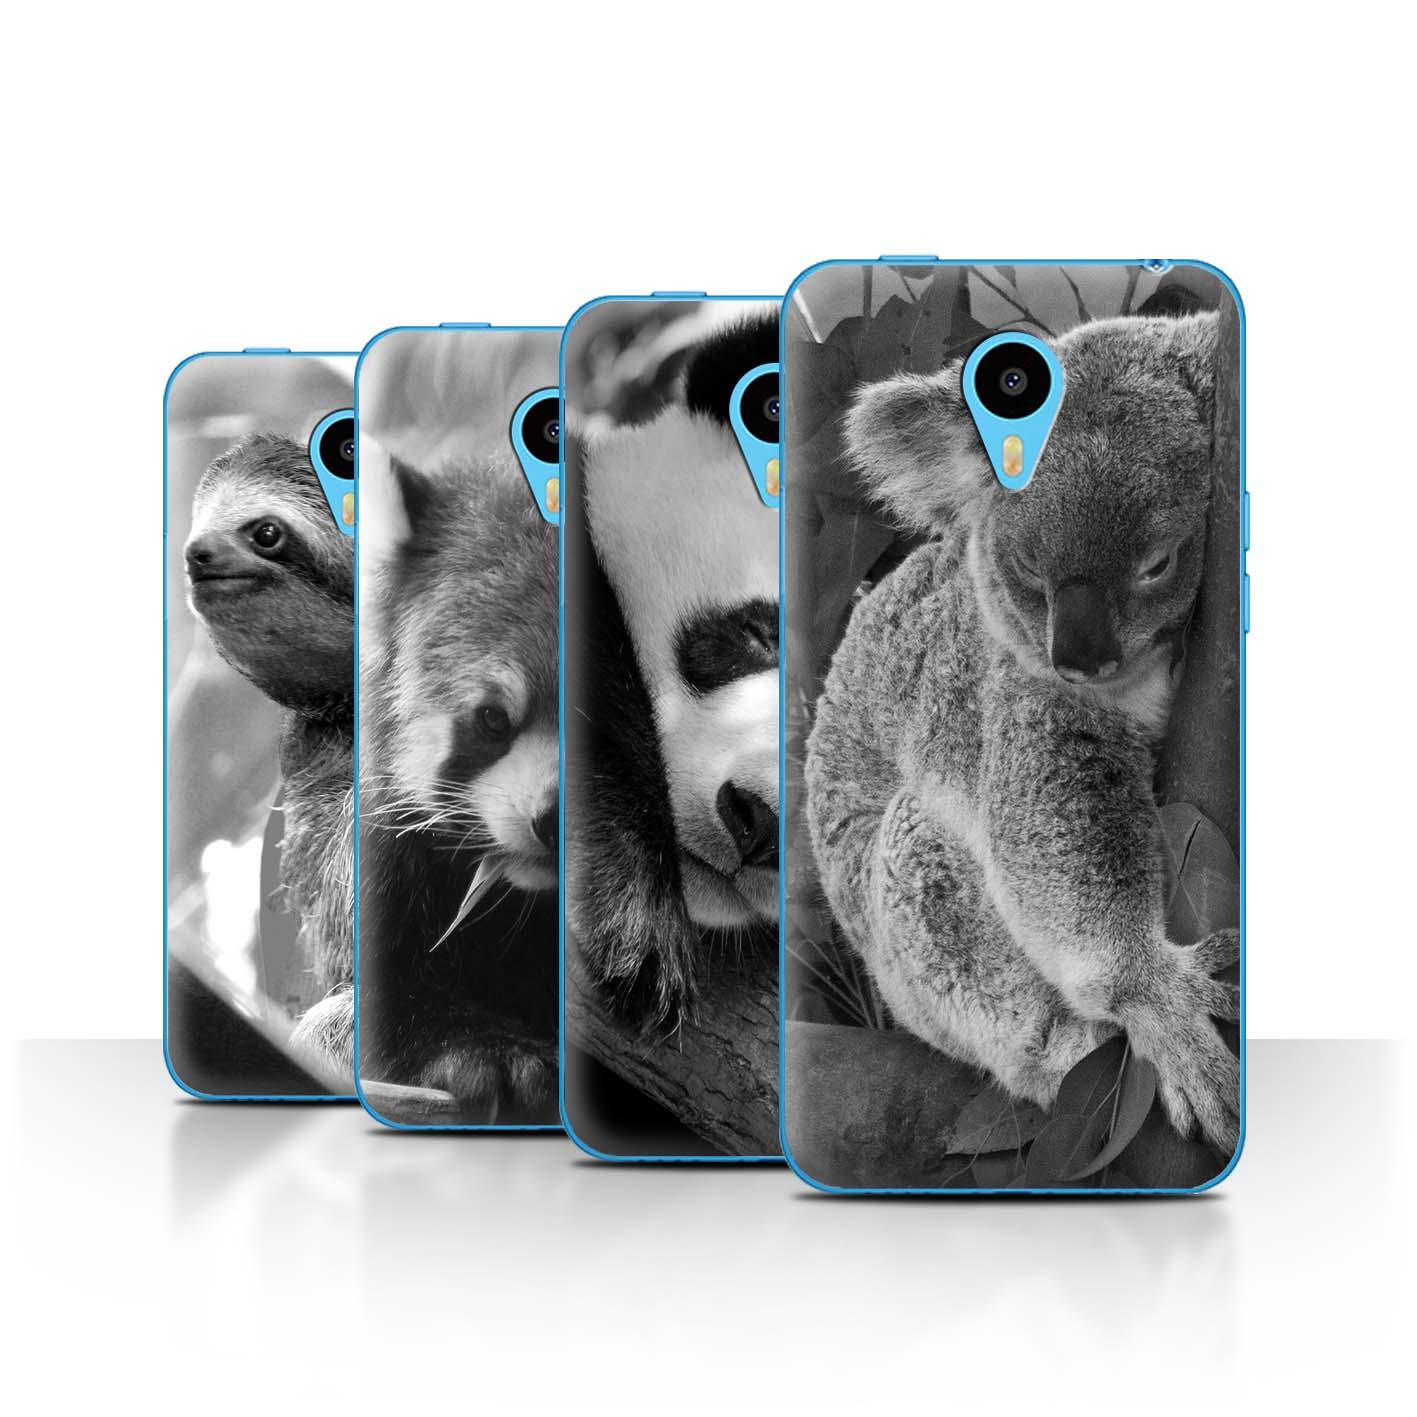 STUFF4-Back-Case-Cover-Skin-for-Meizu-M1N-Mono-Zoo-Animals